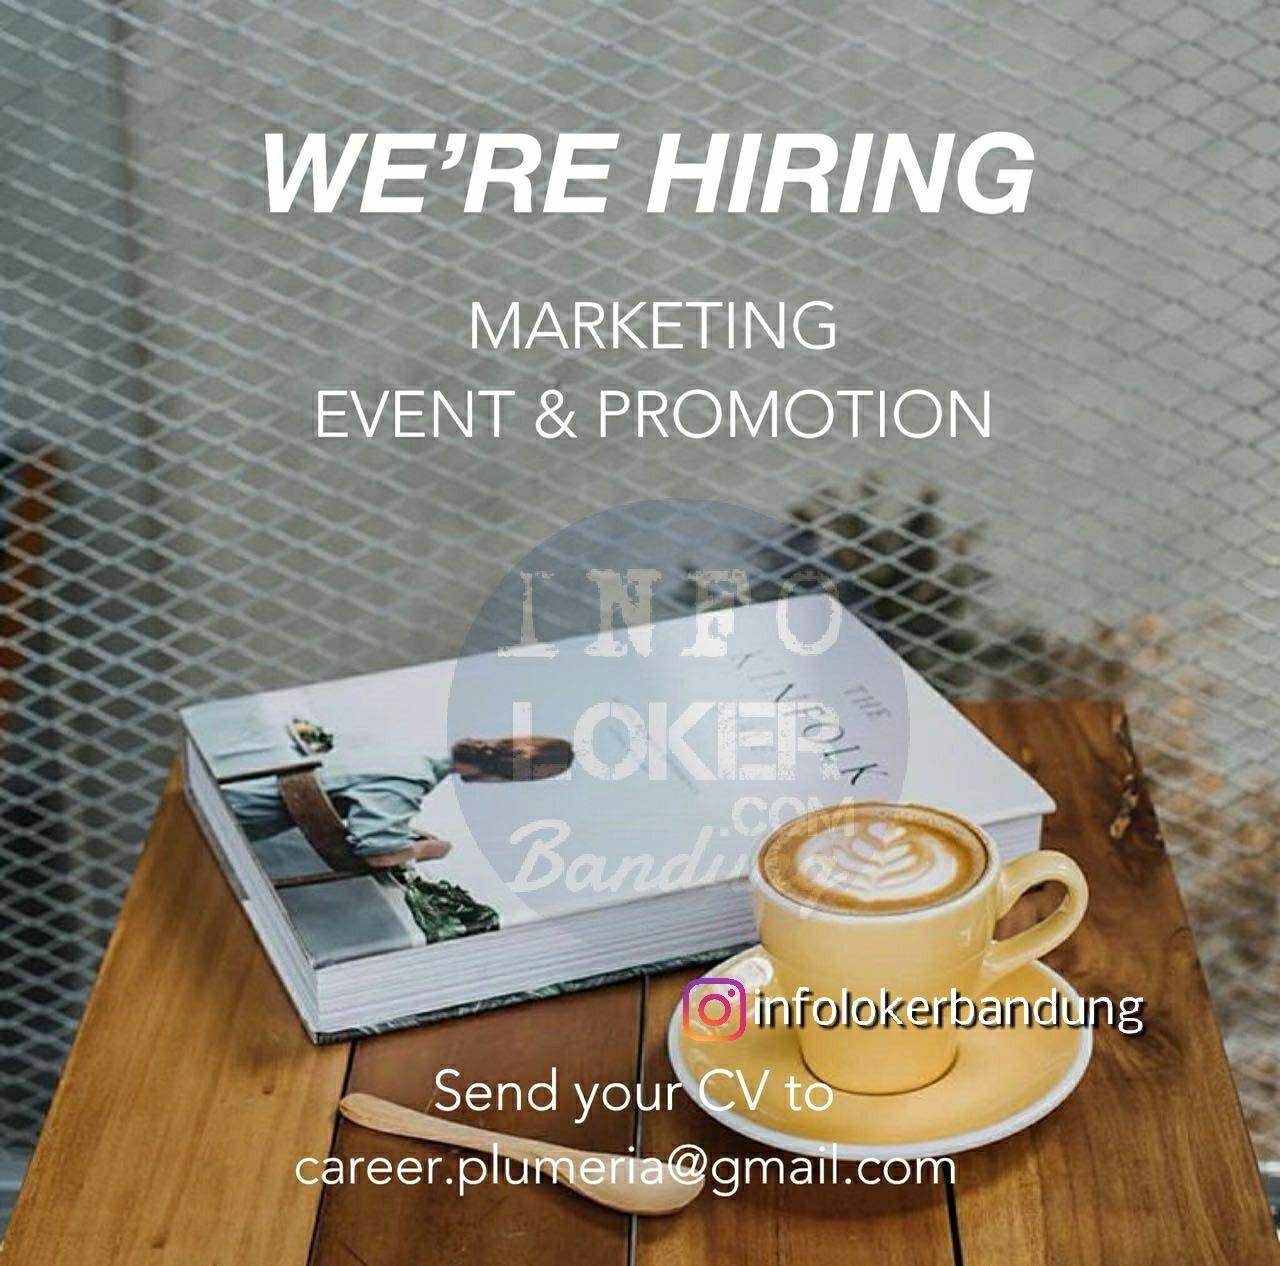 Lowongan Kerja Marketing Event & Promotion Plumeria Cafe & Ristorante Bandung Maret 2018